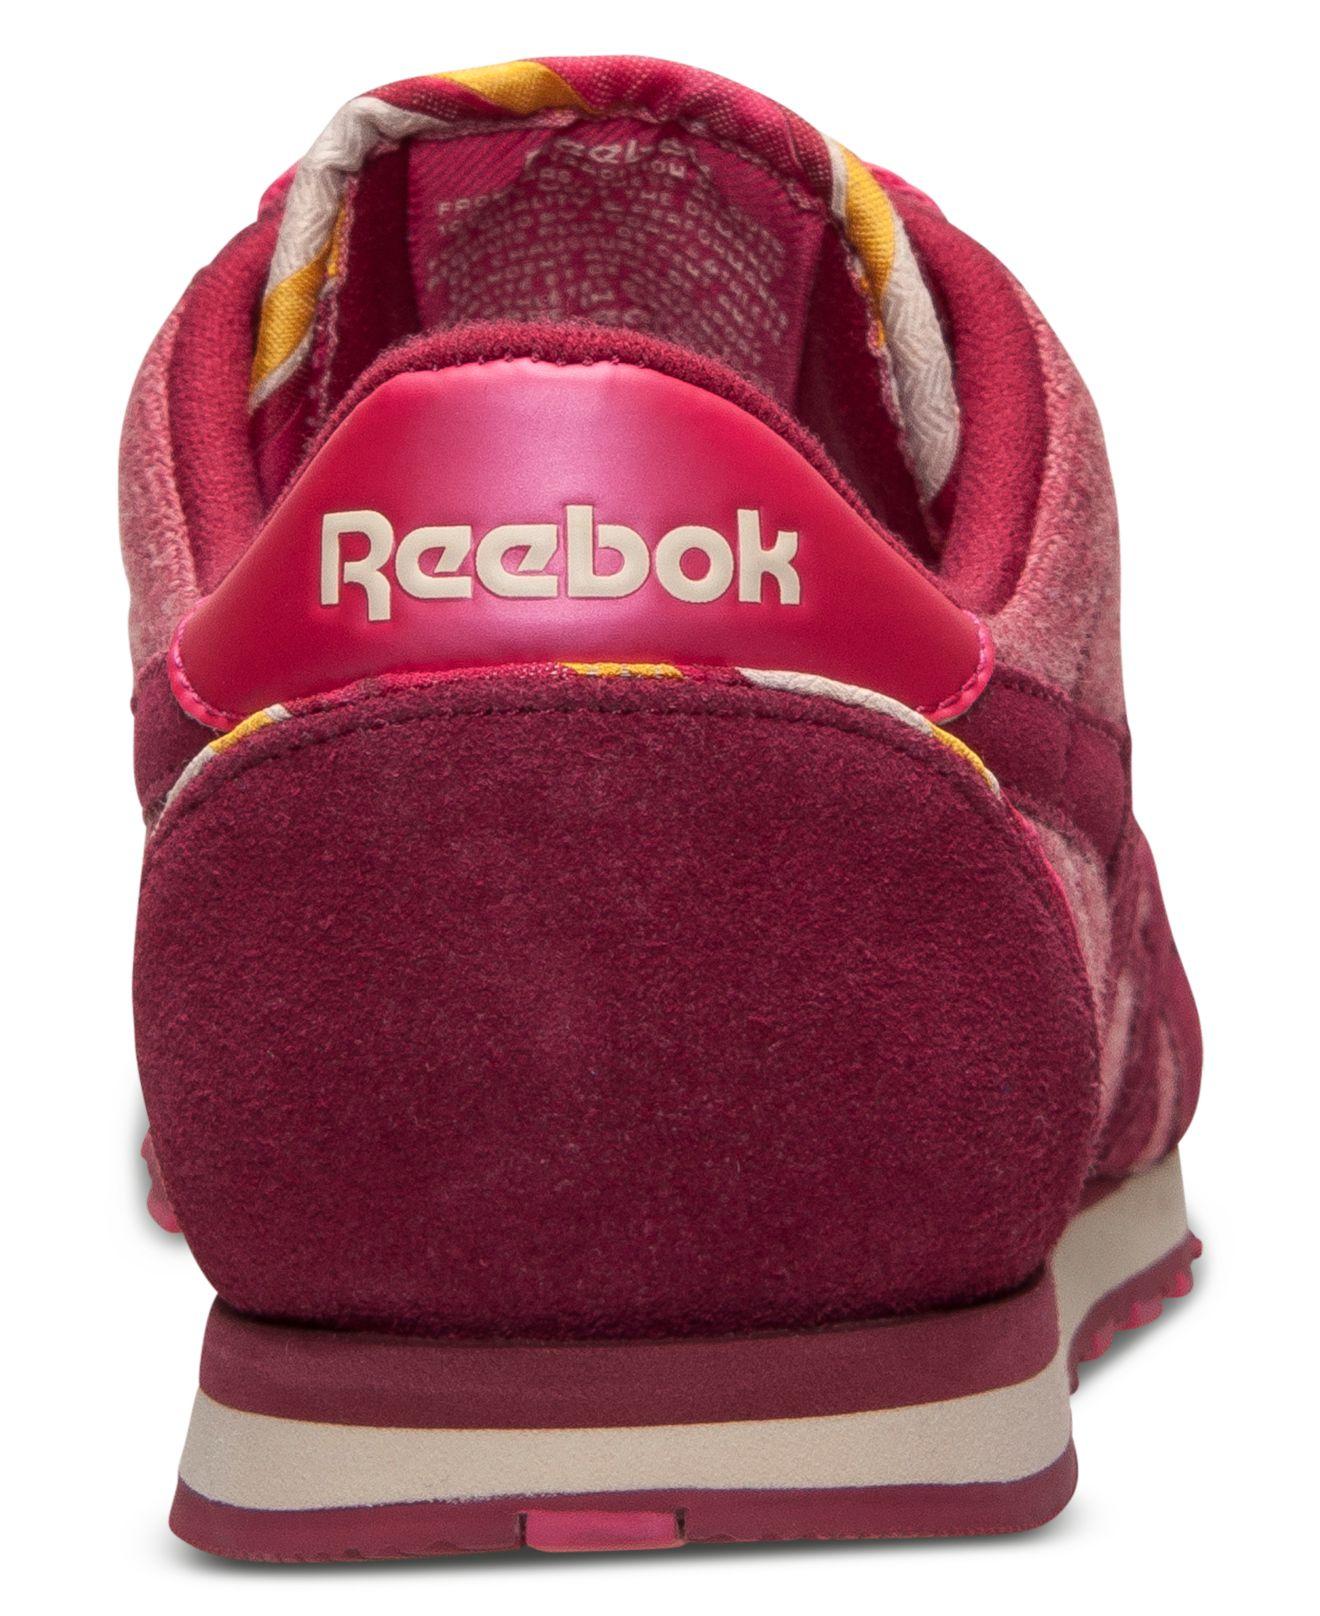 b2e896e98dc Lyst - Reebok Women S Classic Nylon Slim Jacquard Casual Sneakers ...